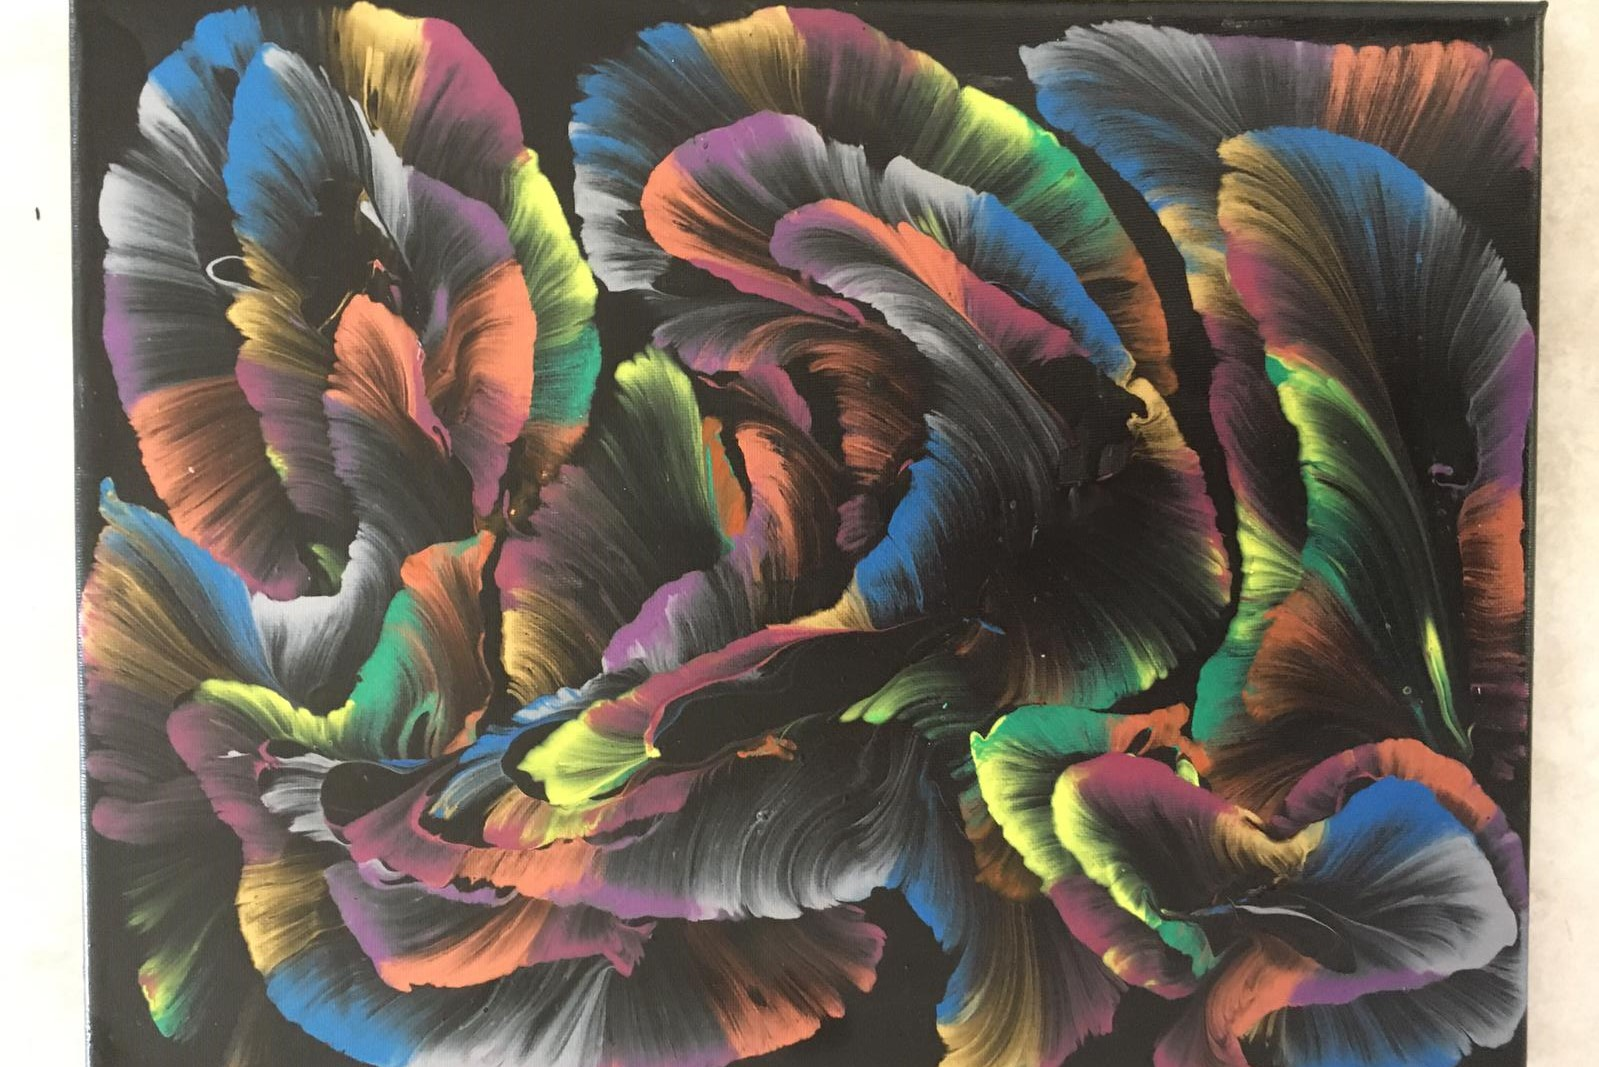 Art Mindfulness at HMCIPS